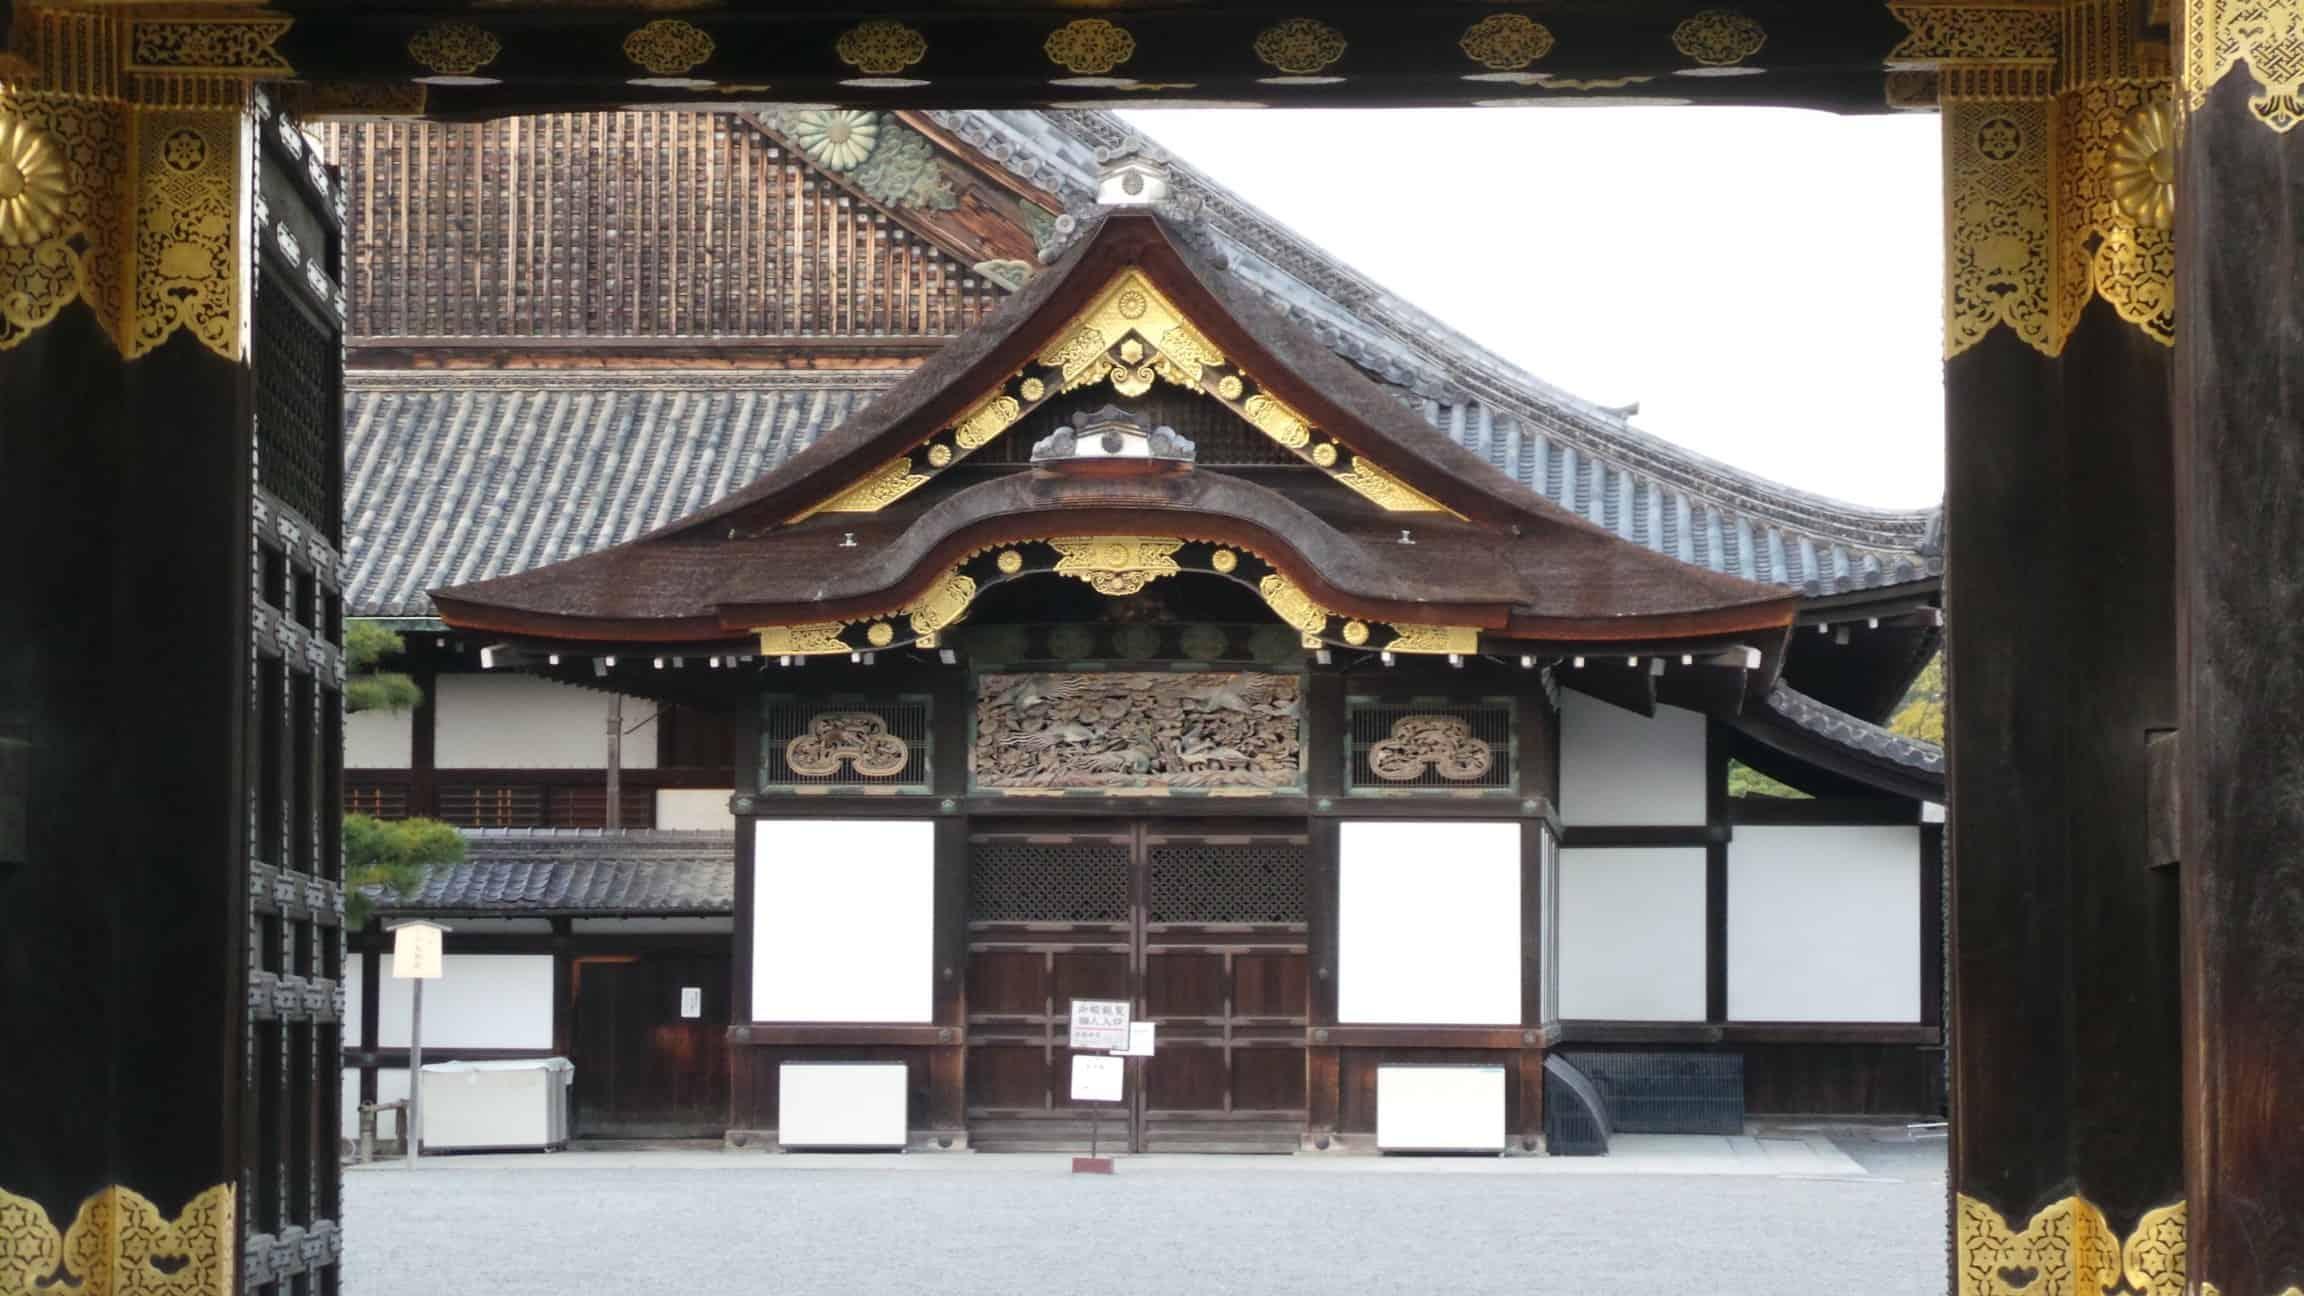 Samurai Castle in Kyoto-Japan - Samurai Innovation